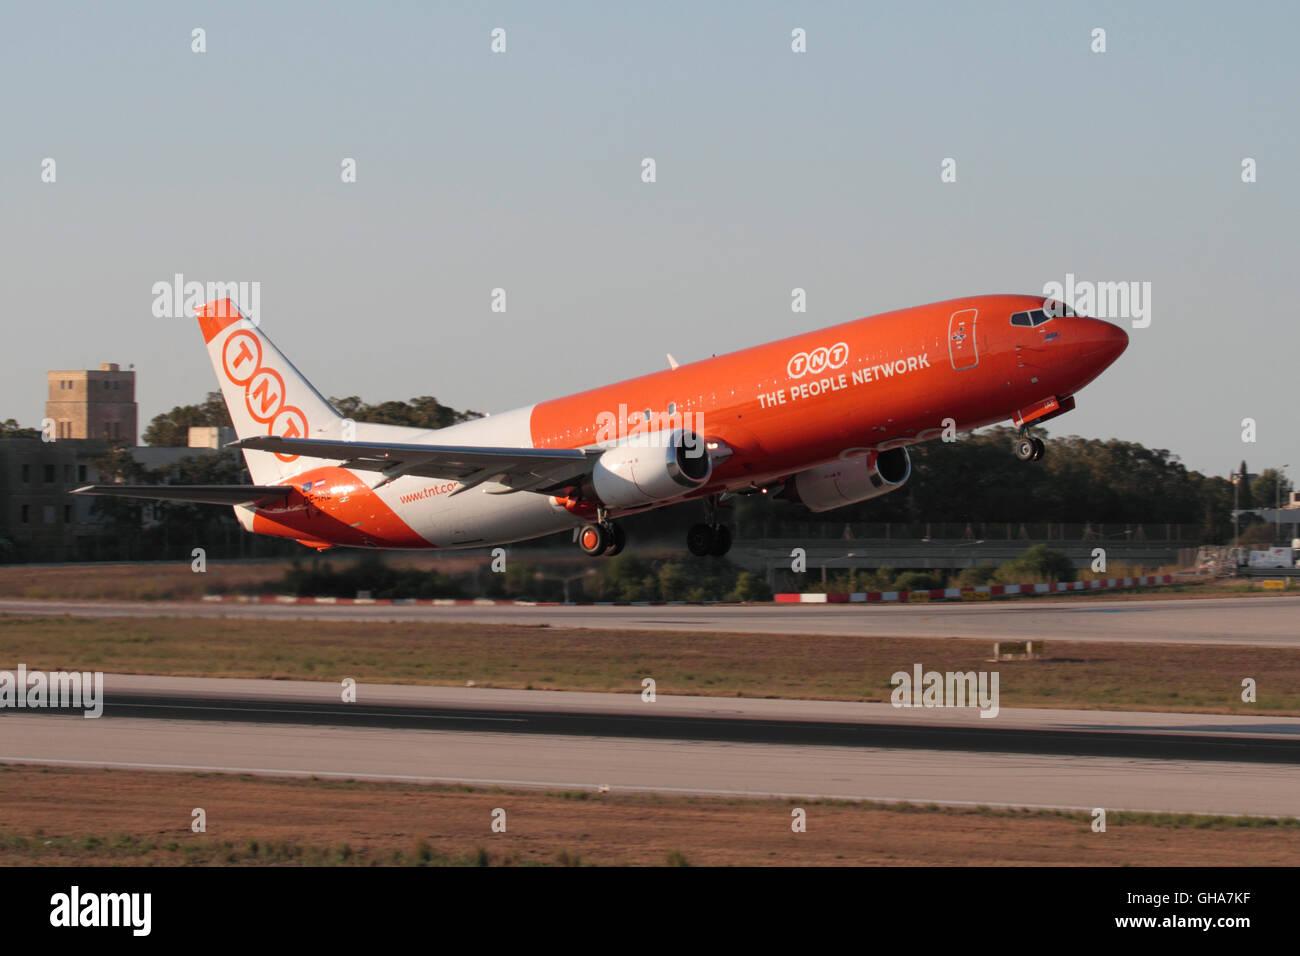 TNT Airways Boeing 737-400F cargo jet plane taking off from Malta - Stock Image